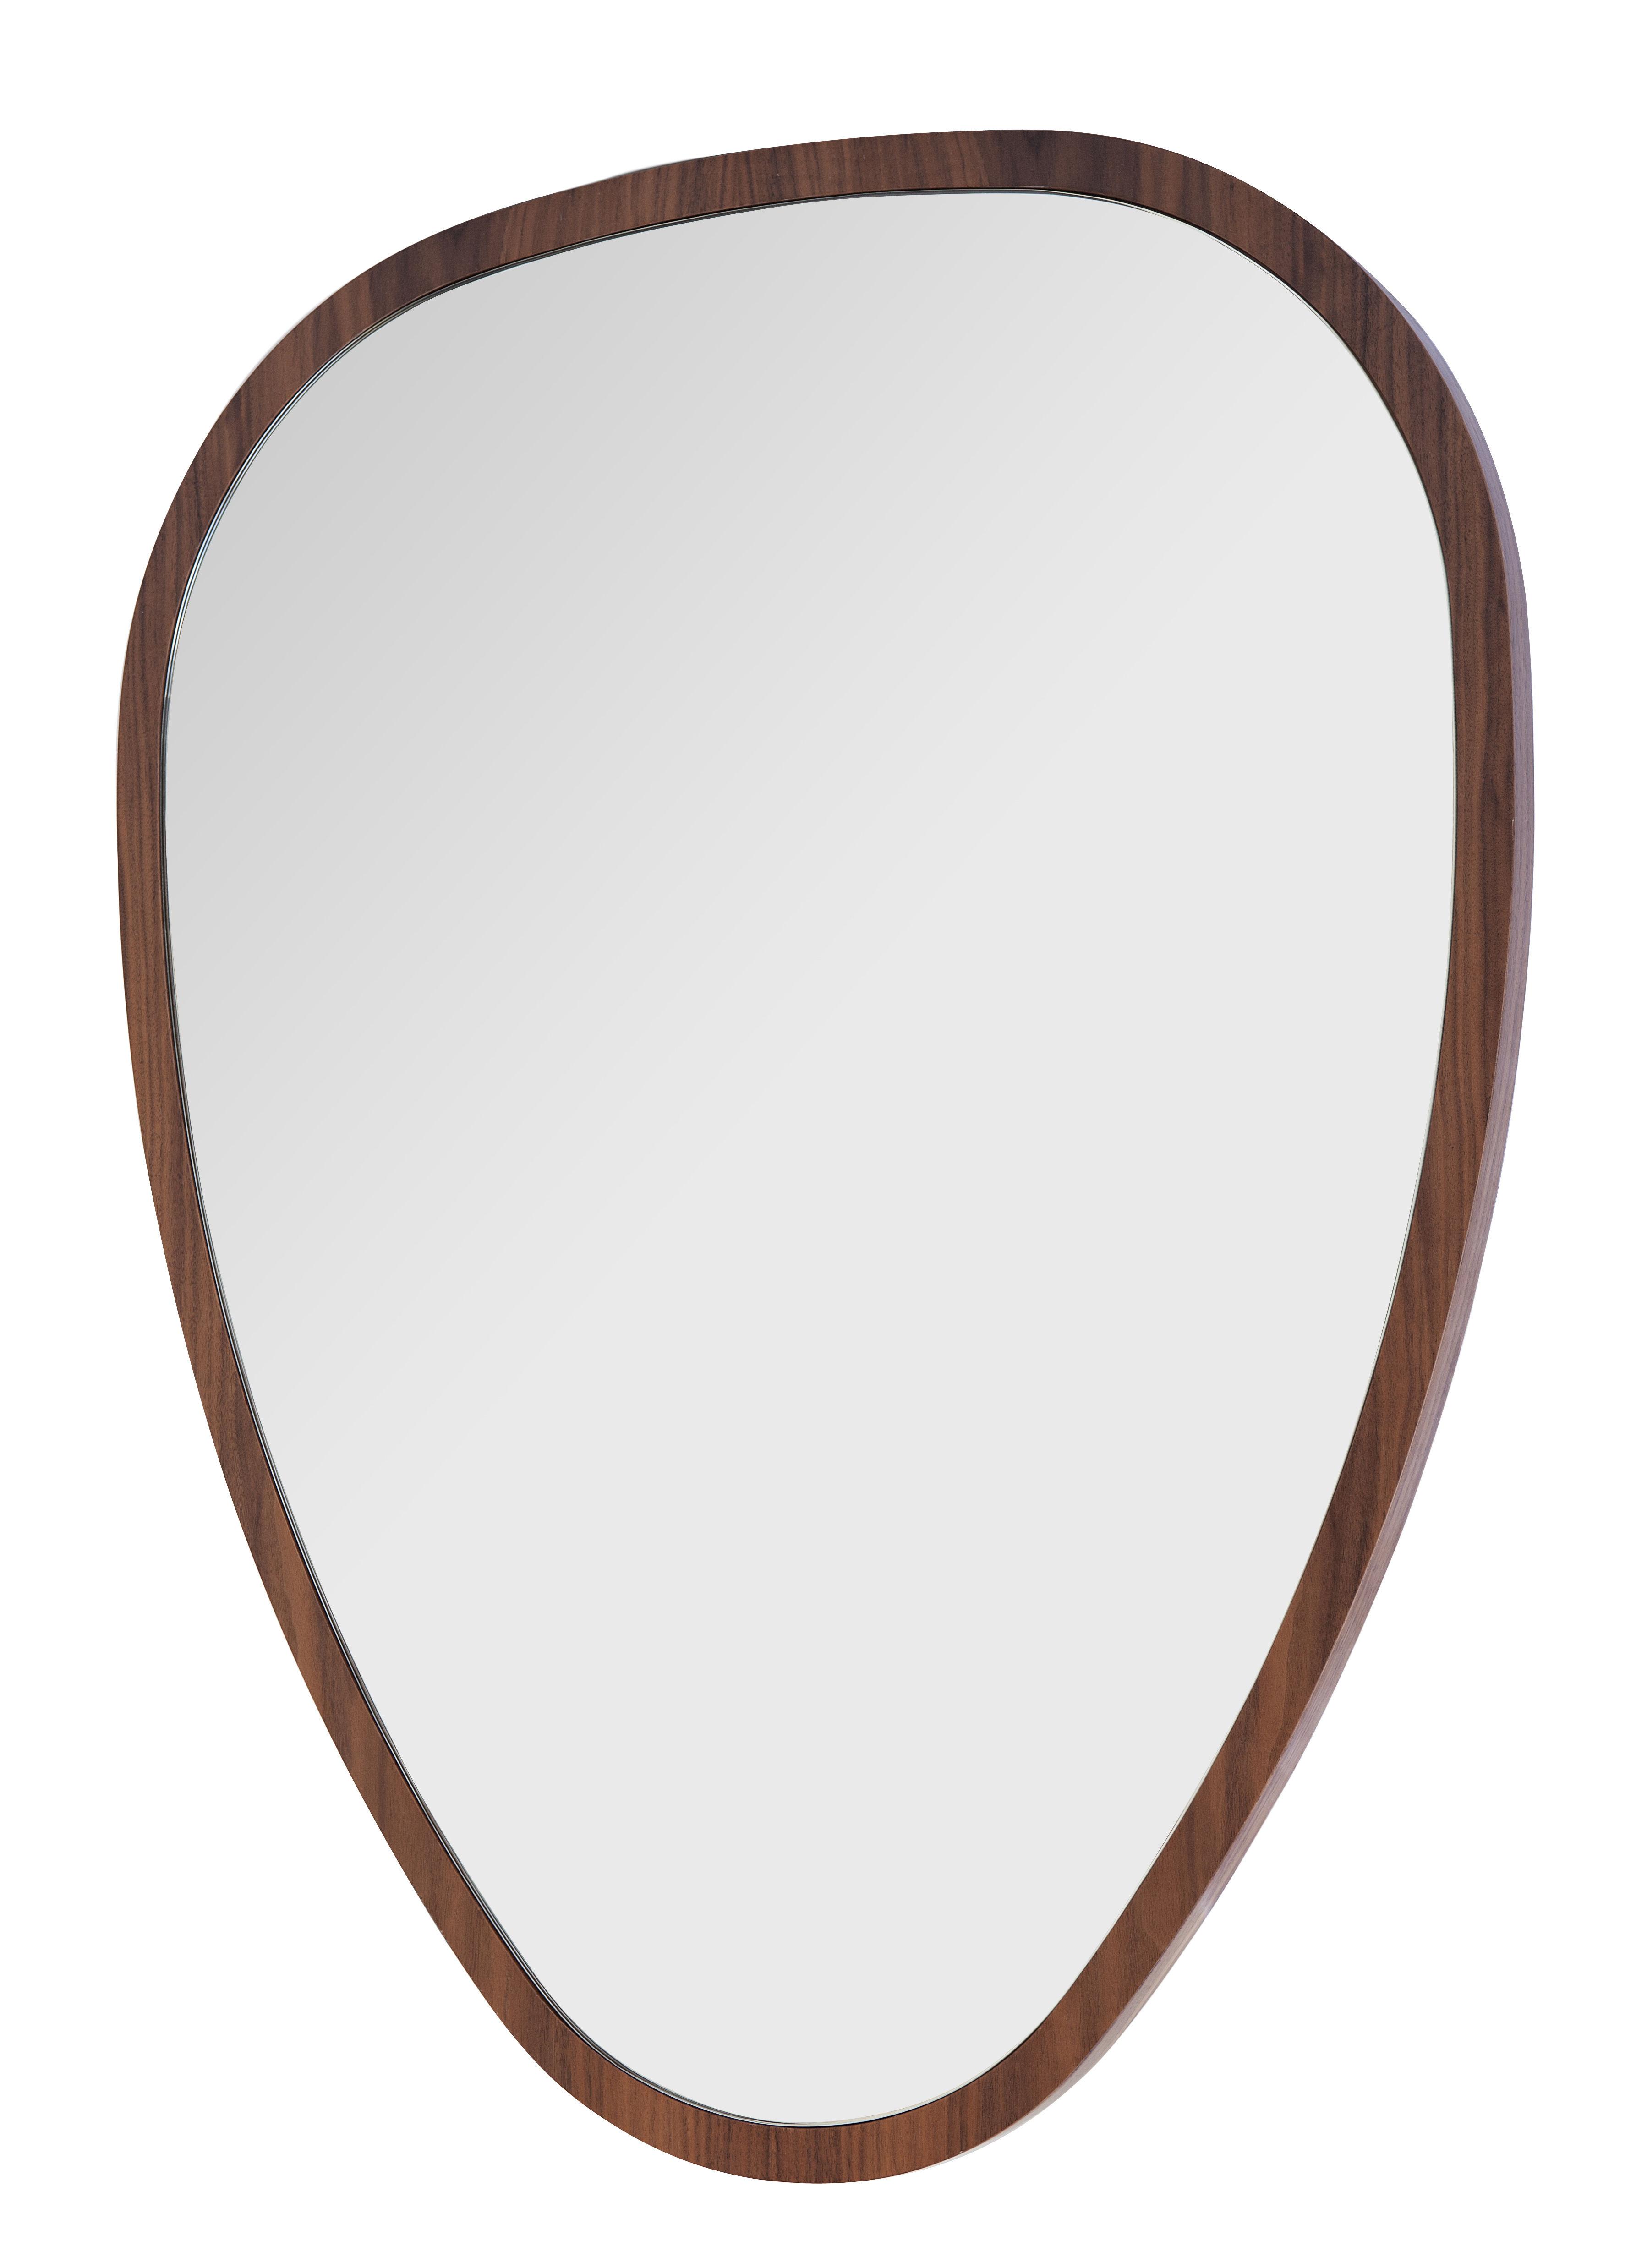 Déco - Miroirs - Miroir mural Ovo Medium / 58 x 75 cm - Noyer - Maison Sarah Lavoine - H 75 cm / Noyer - Noyer